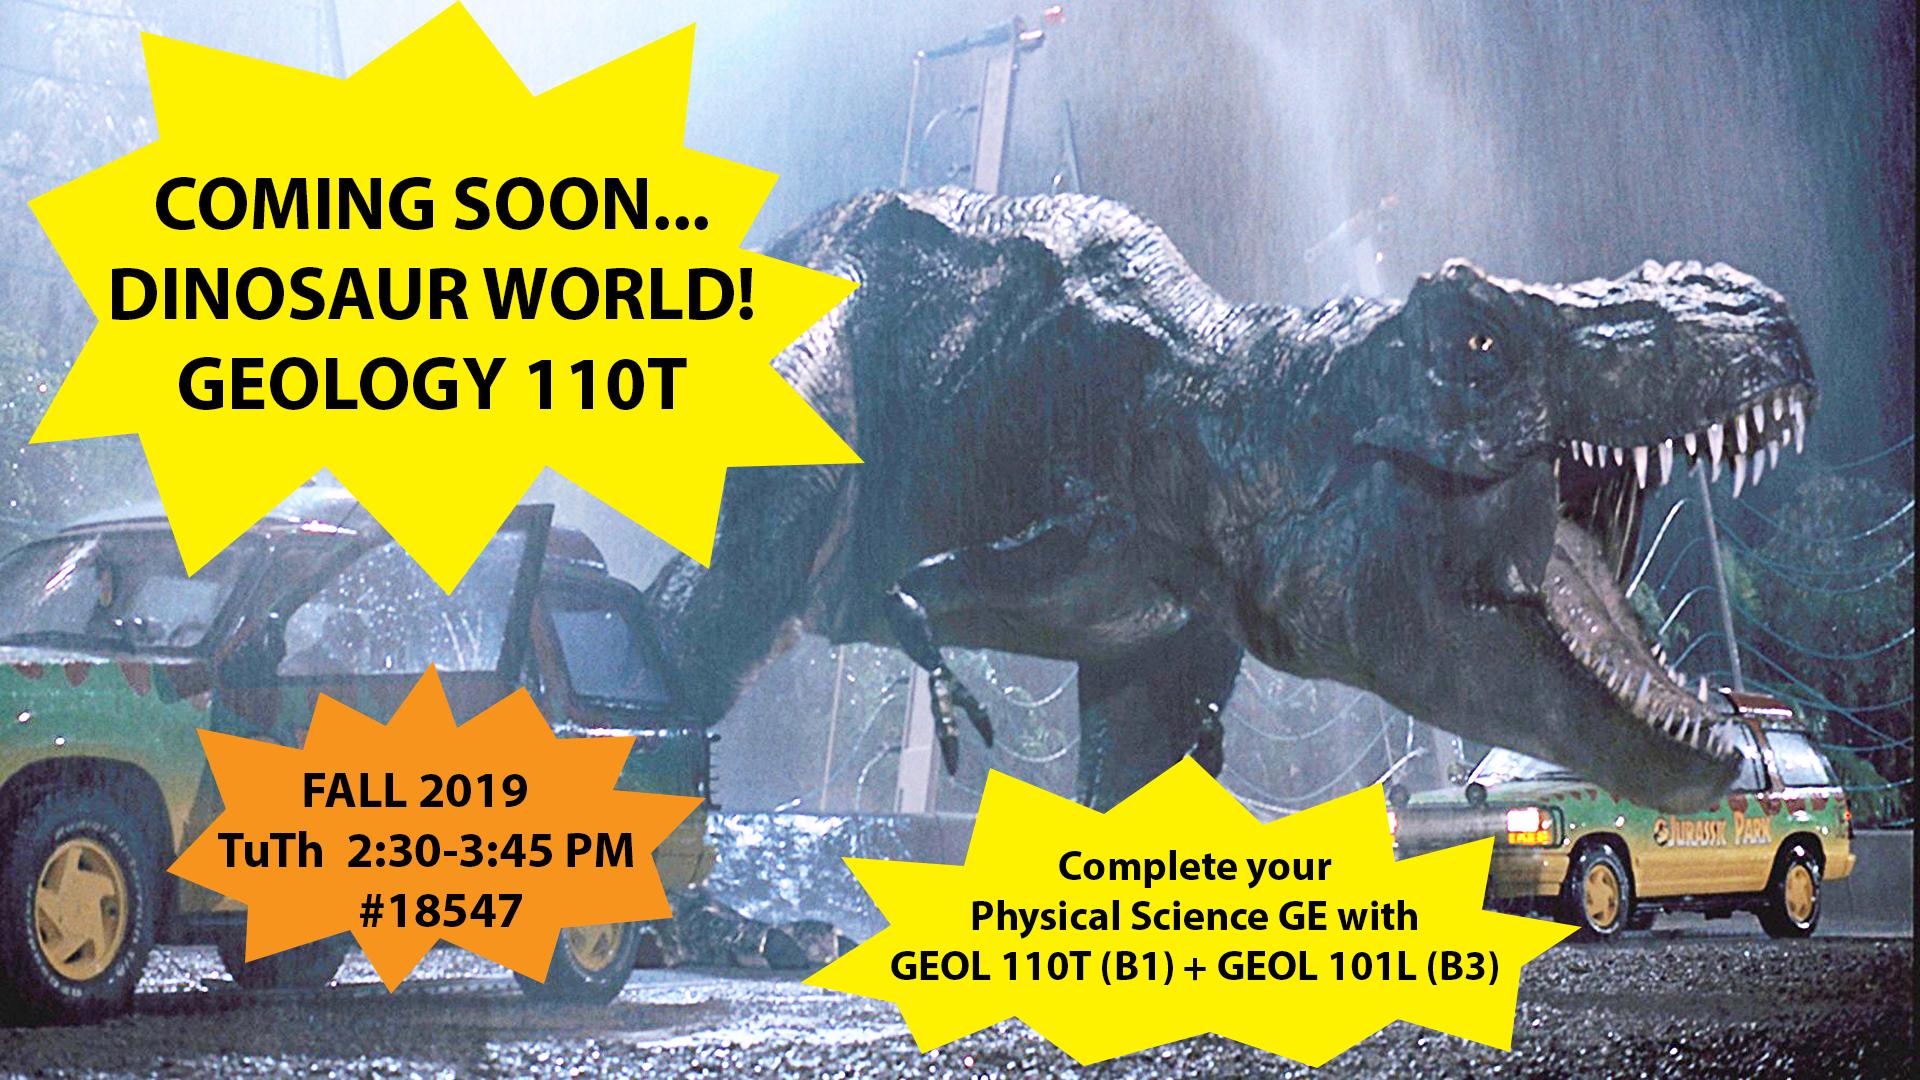 GEOL 110T DINOSAUR WORLD   Geological Sciences CSUF 1920x1080